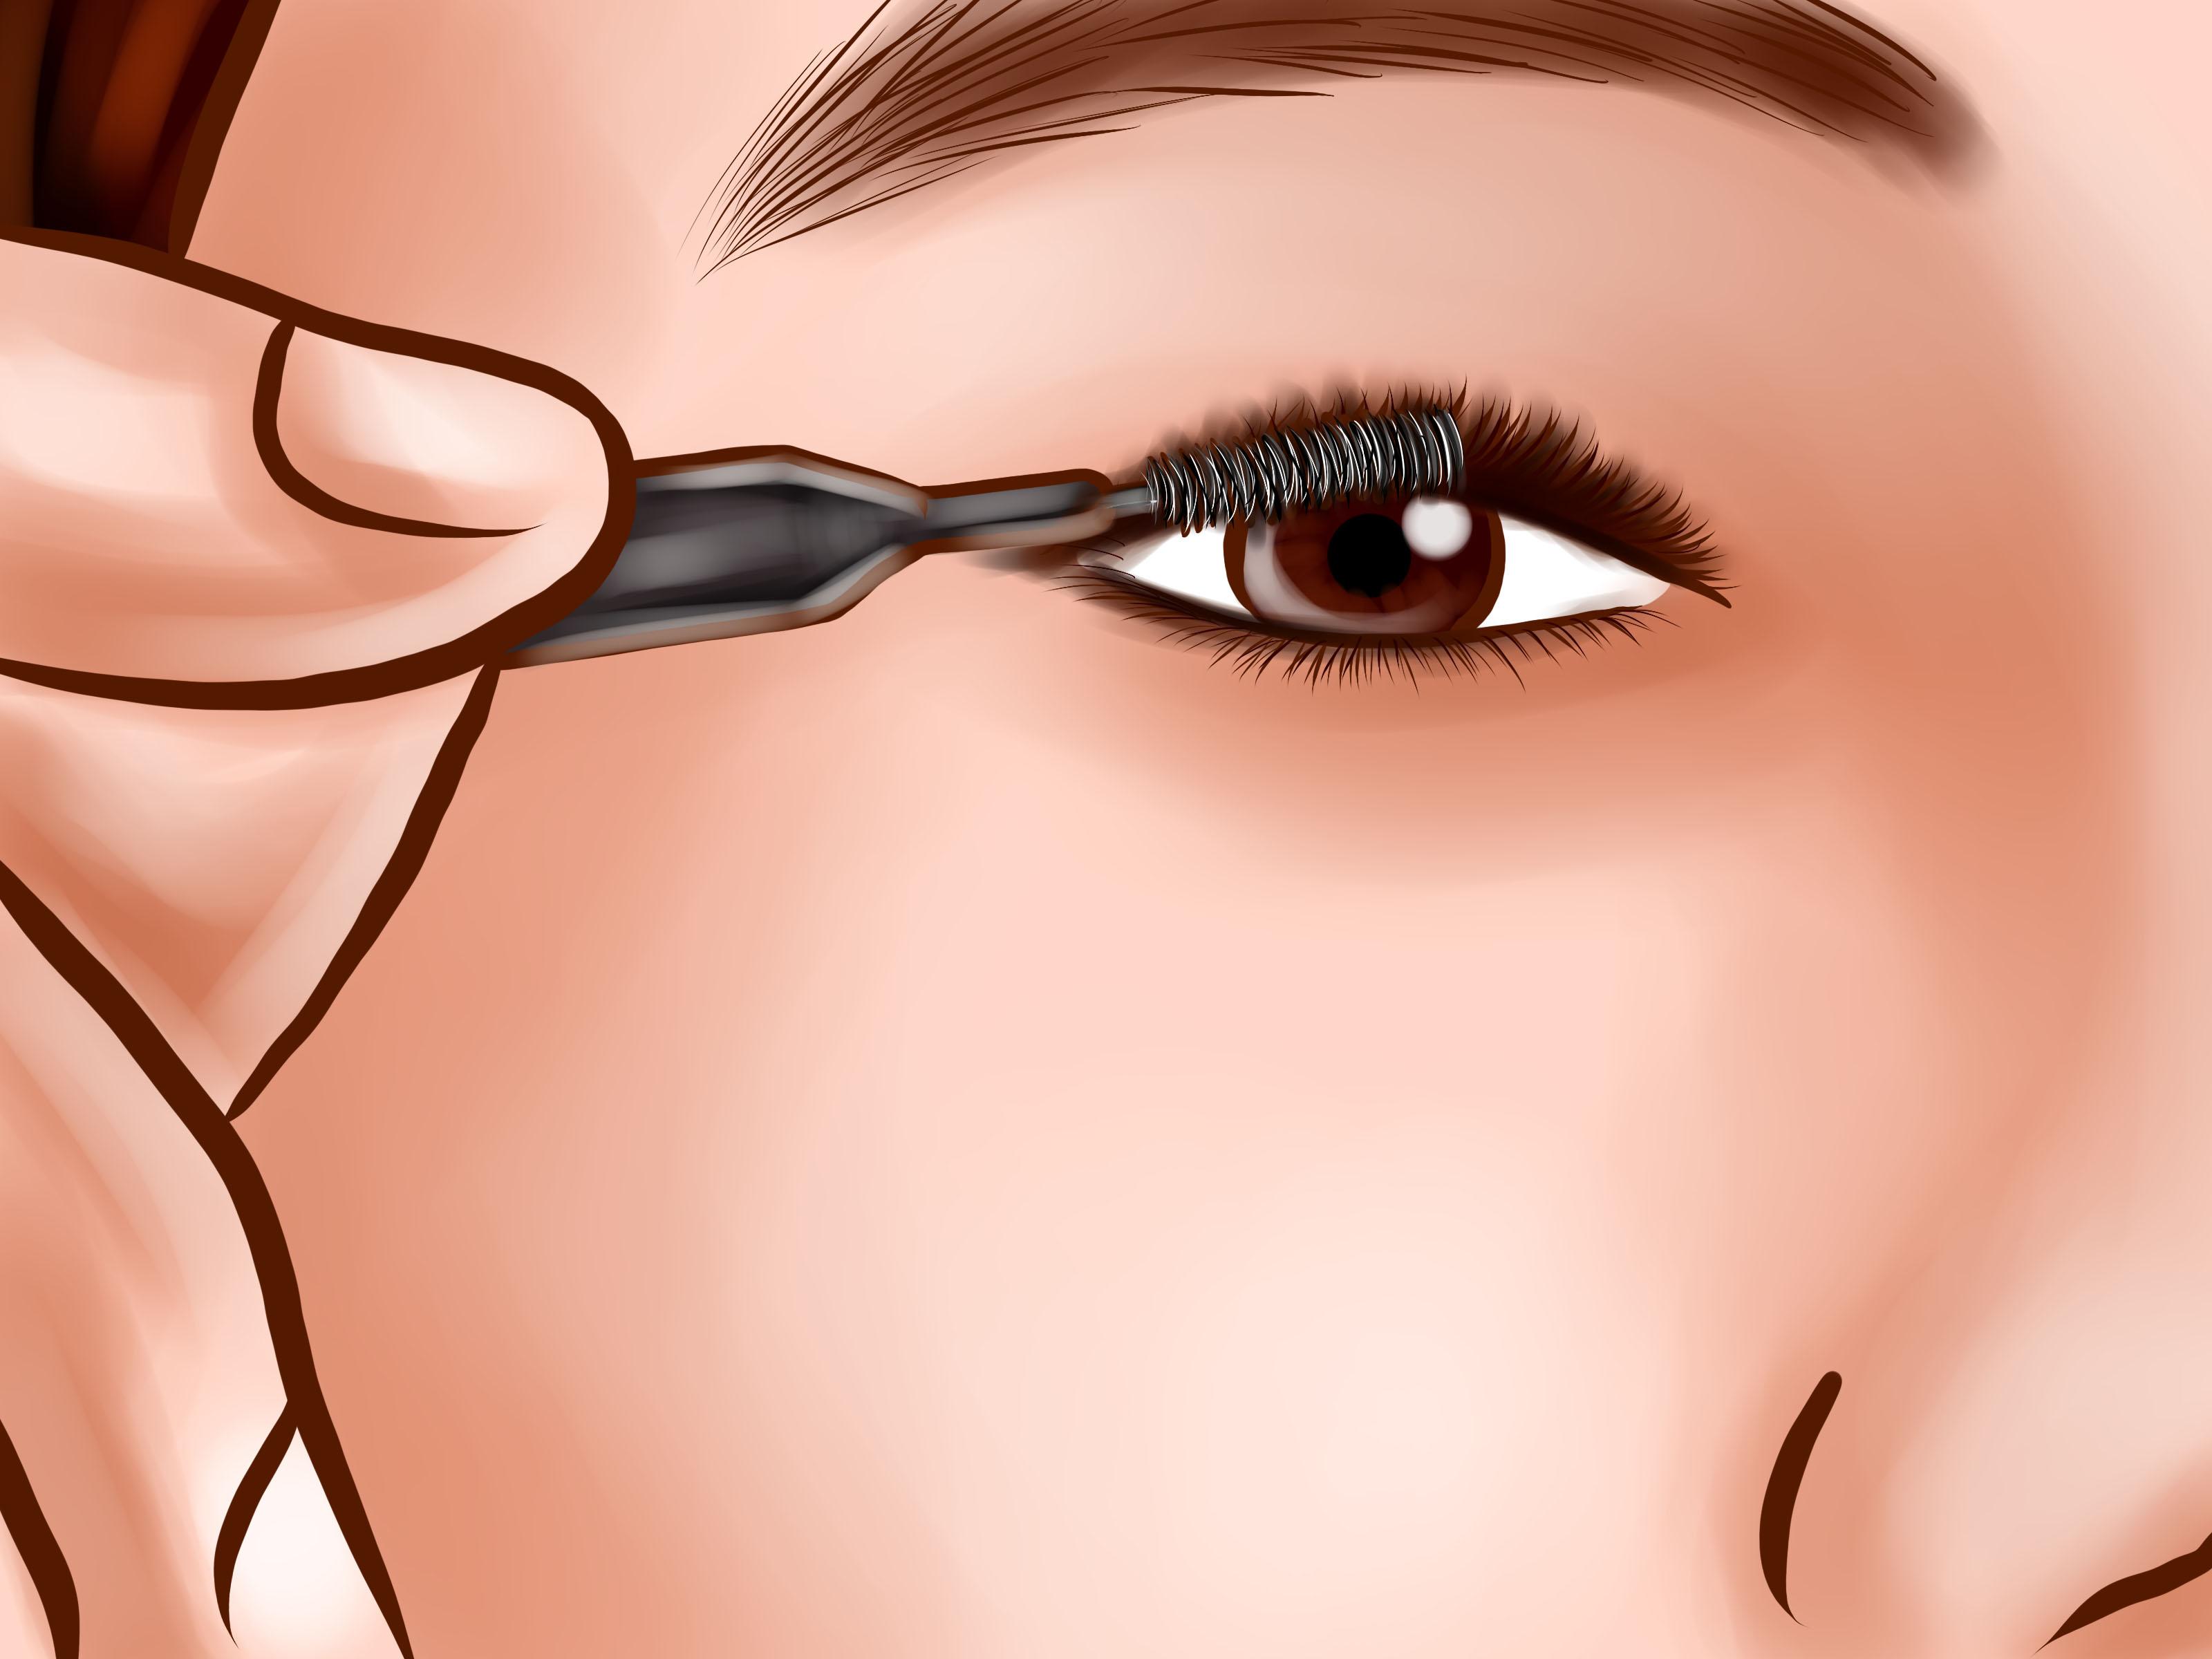 eye makeup tips for green eyes over 50